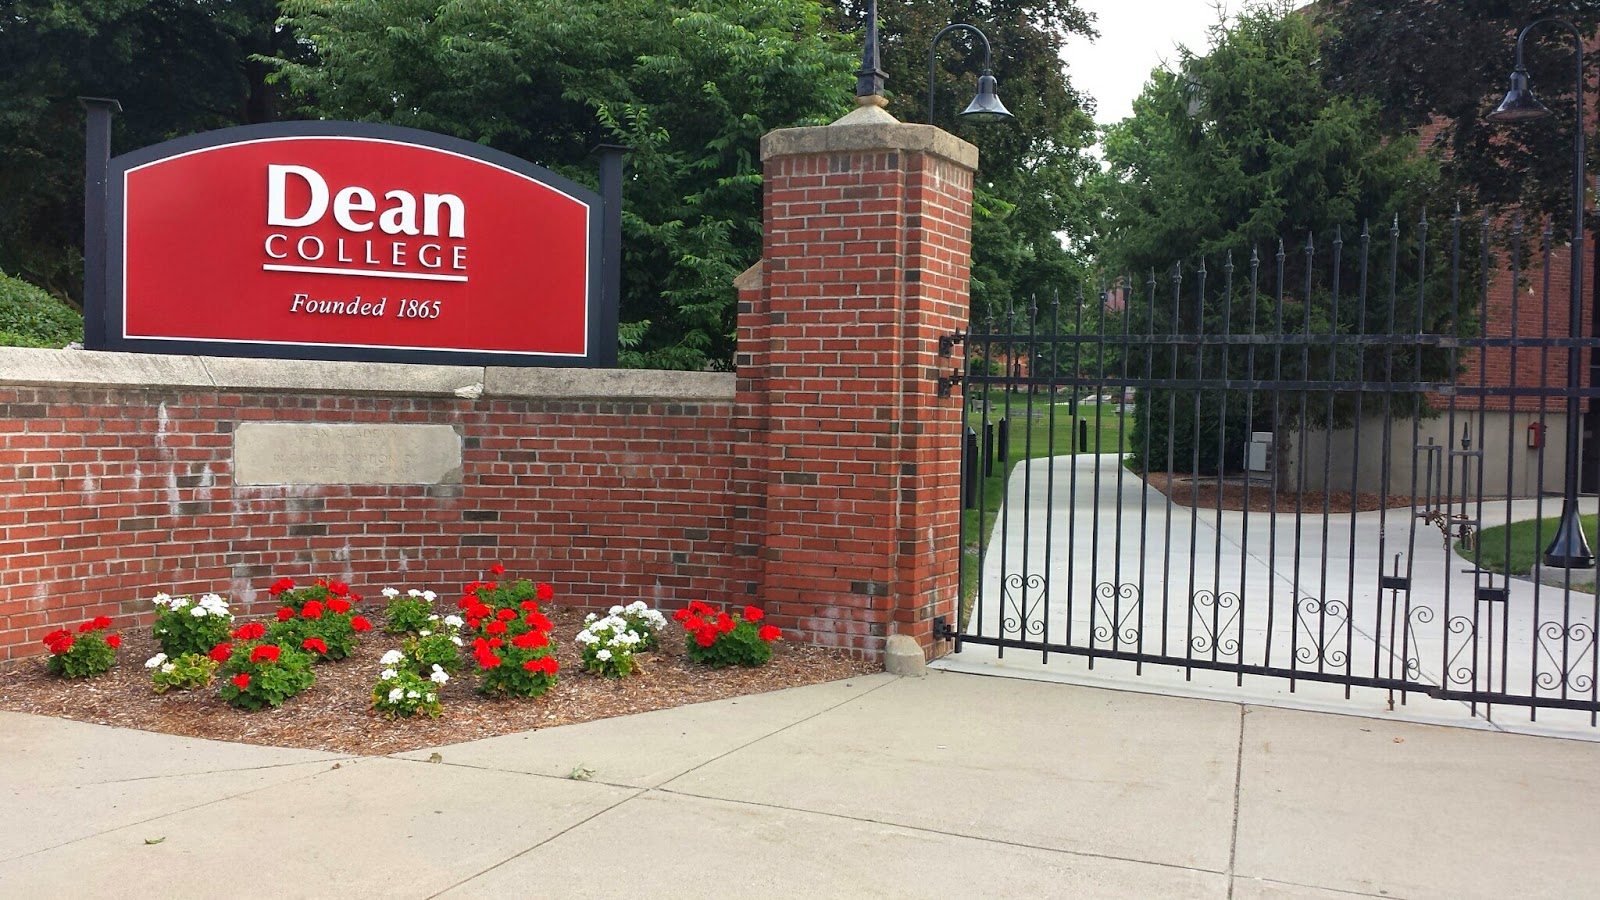 Dean College South Coast Improvement Company